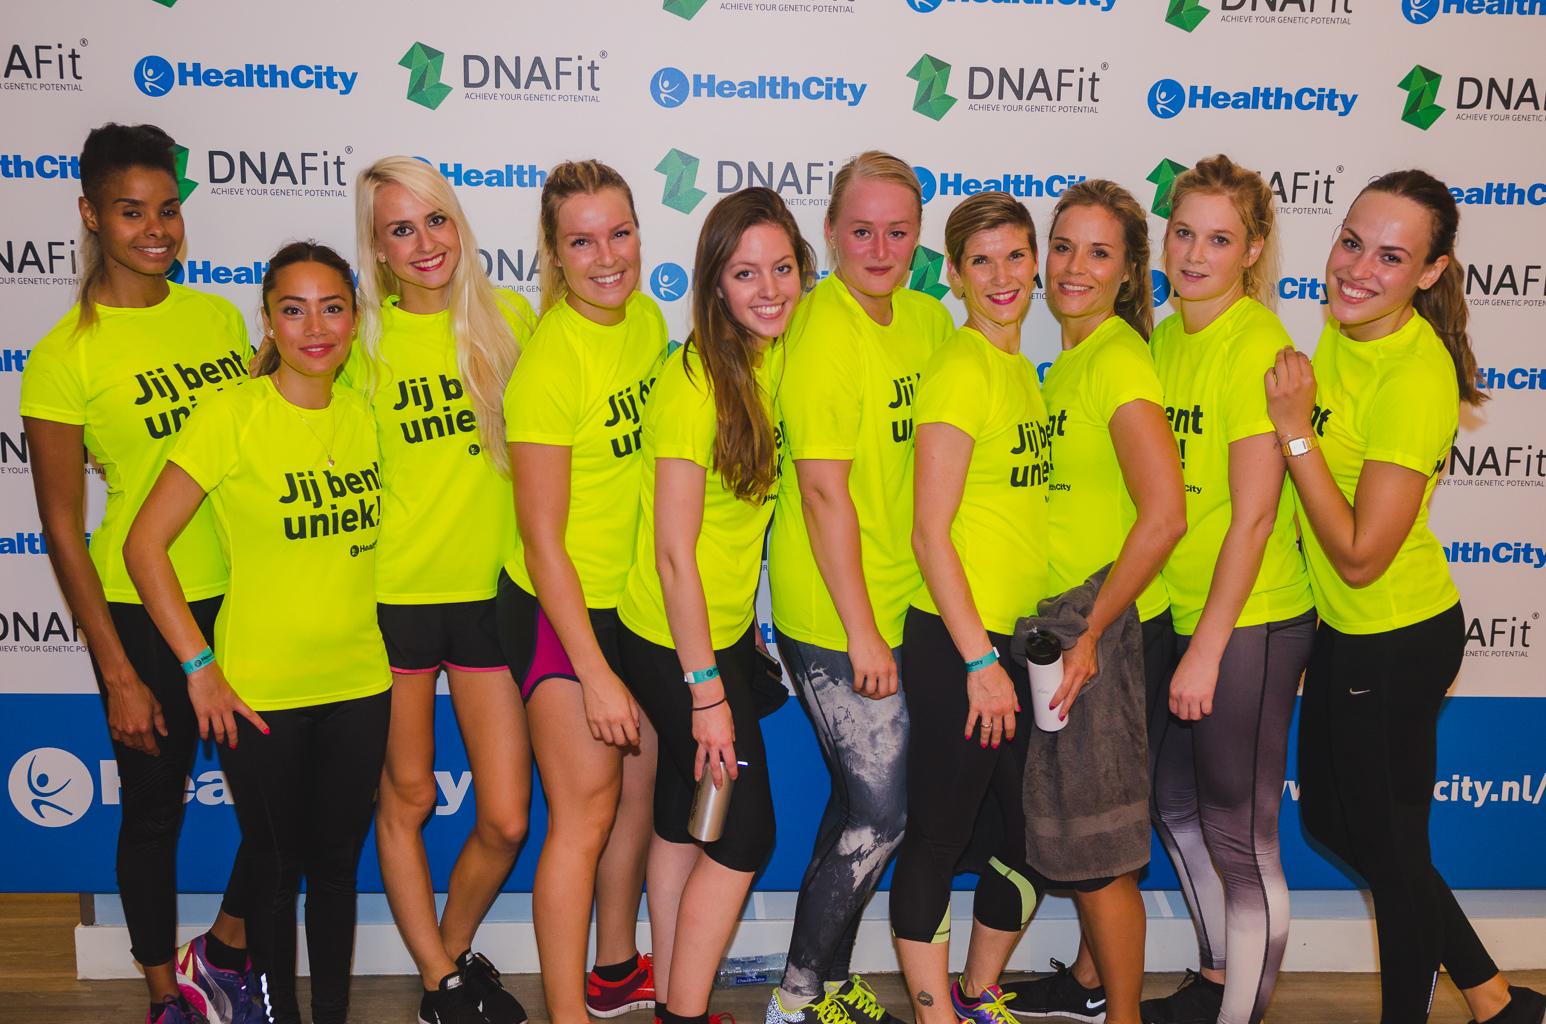 20140917 Healthcity DNAFit-039